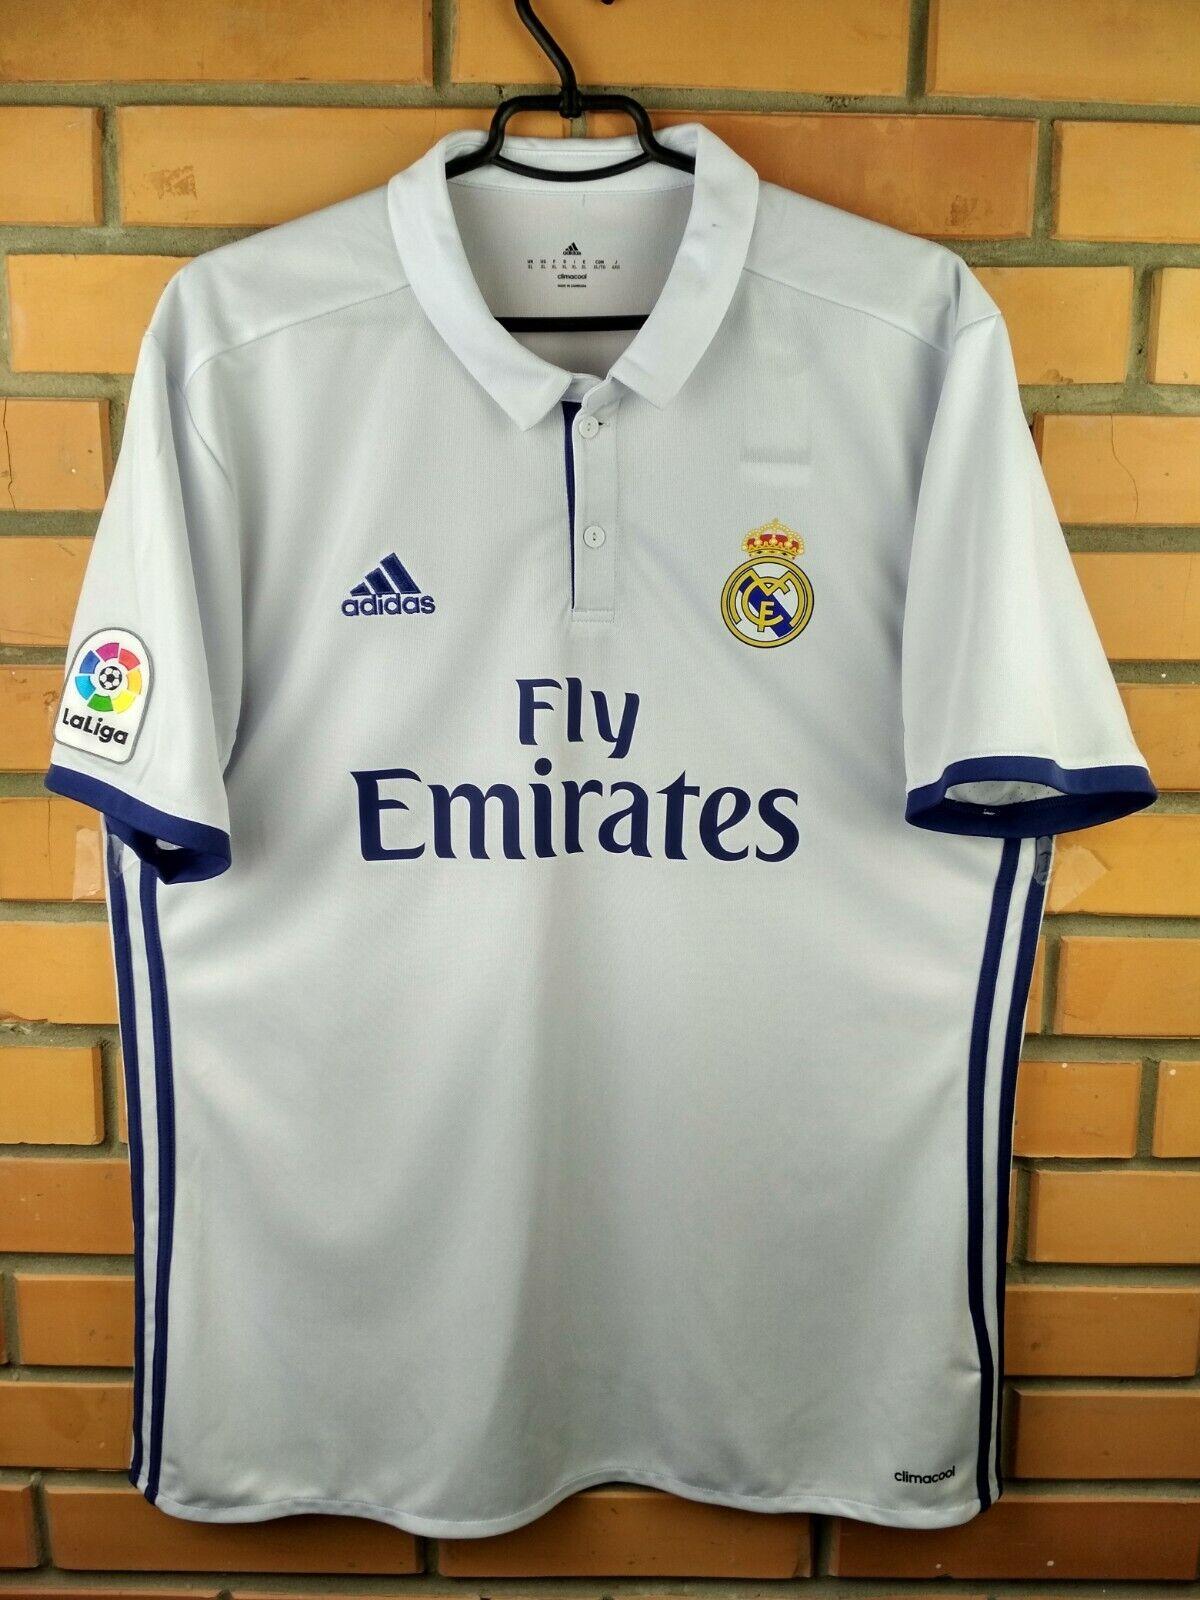 Real Madrid jersey XL 2016 2017 home shirt S94992 soccer football Adidas